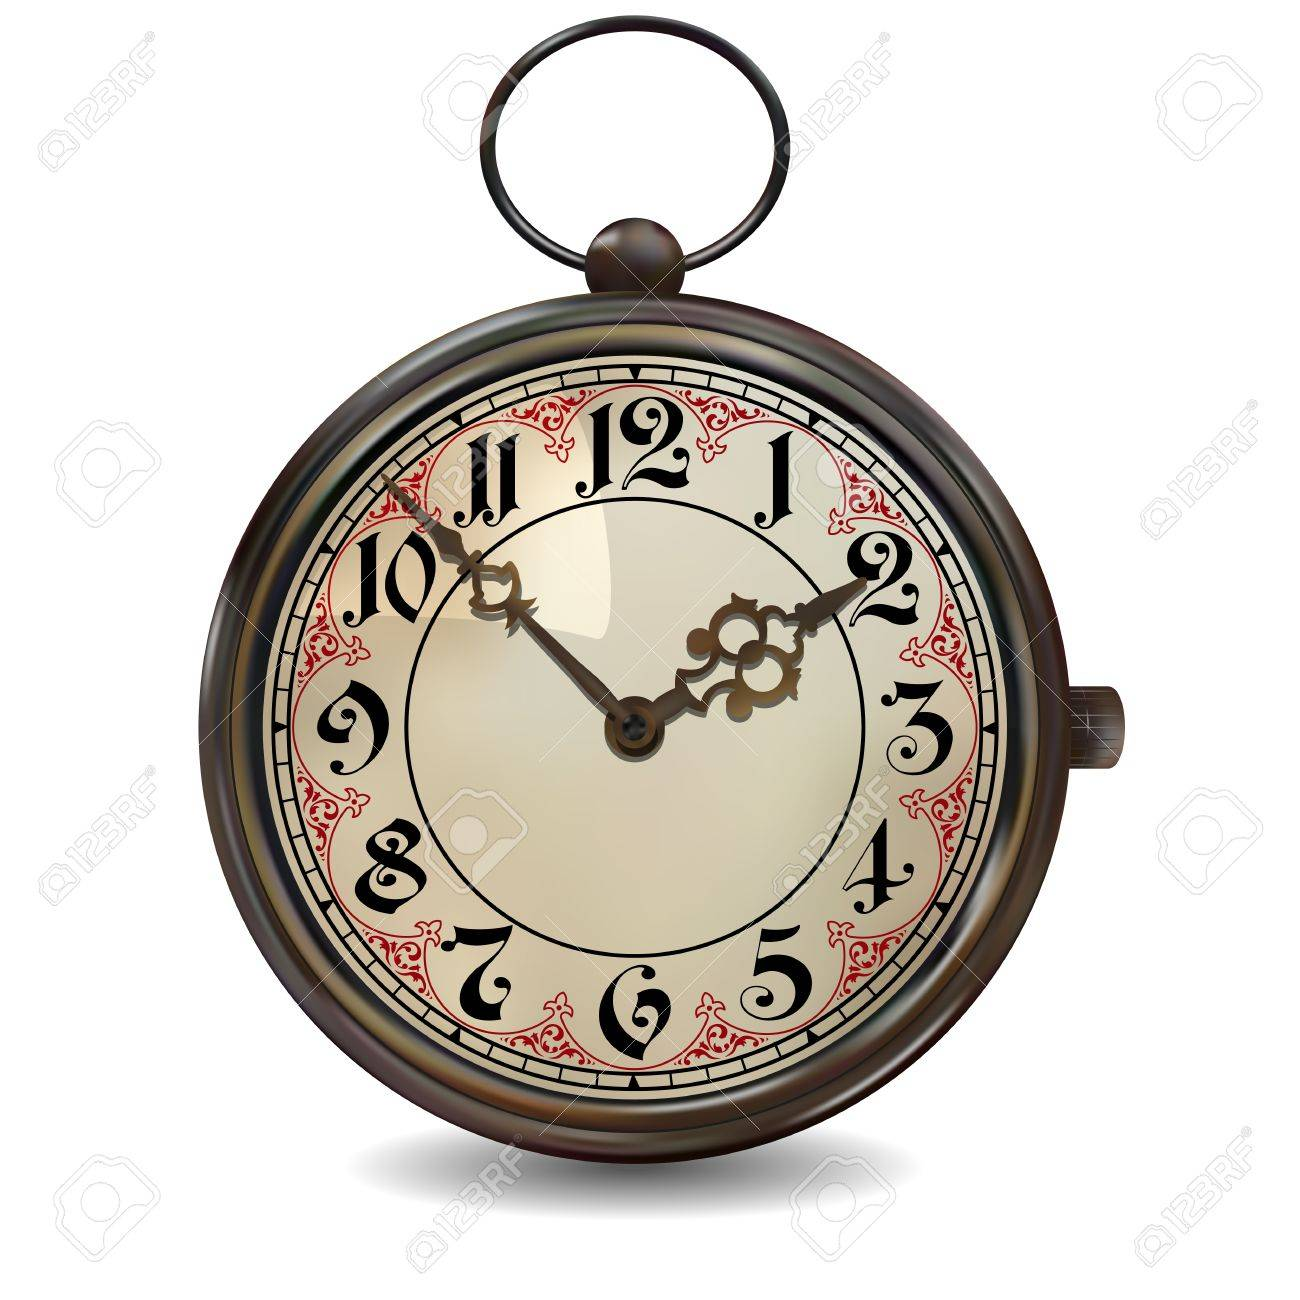 Rusty Pocket Watch Stock Vector - 30533625